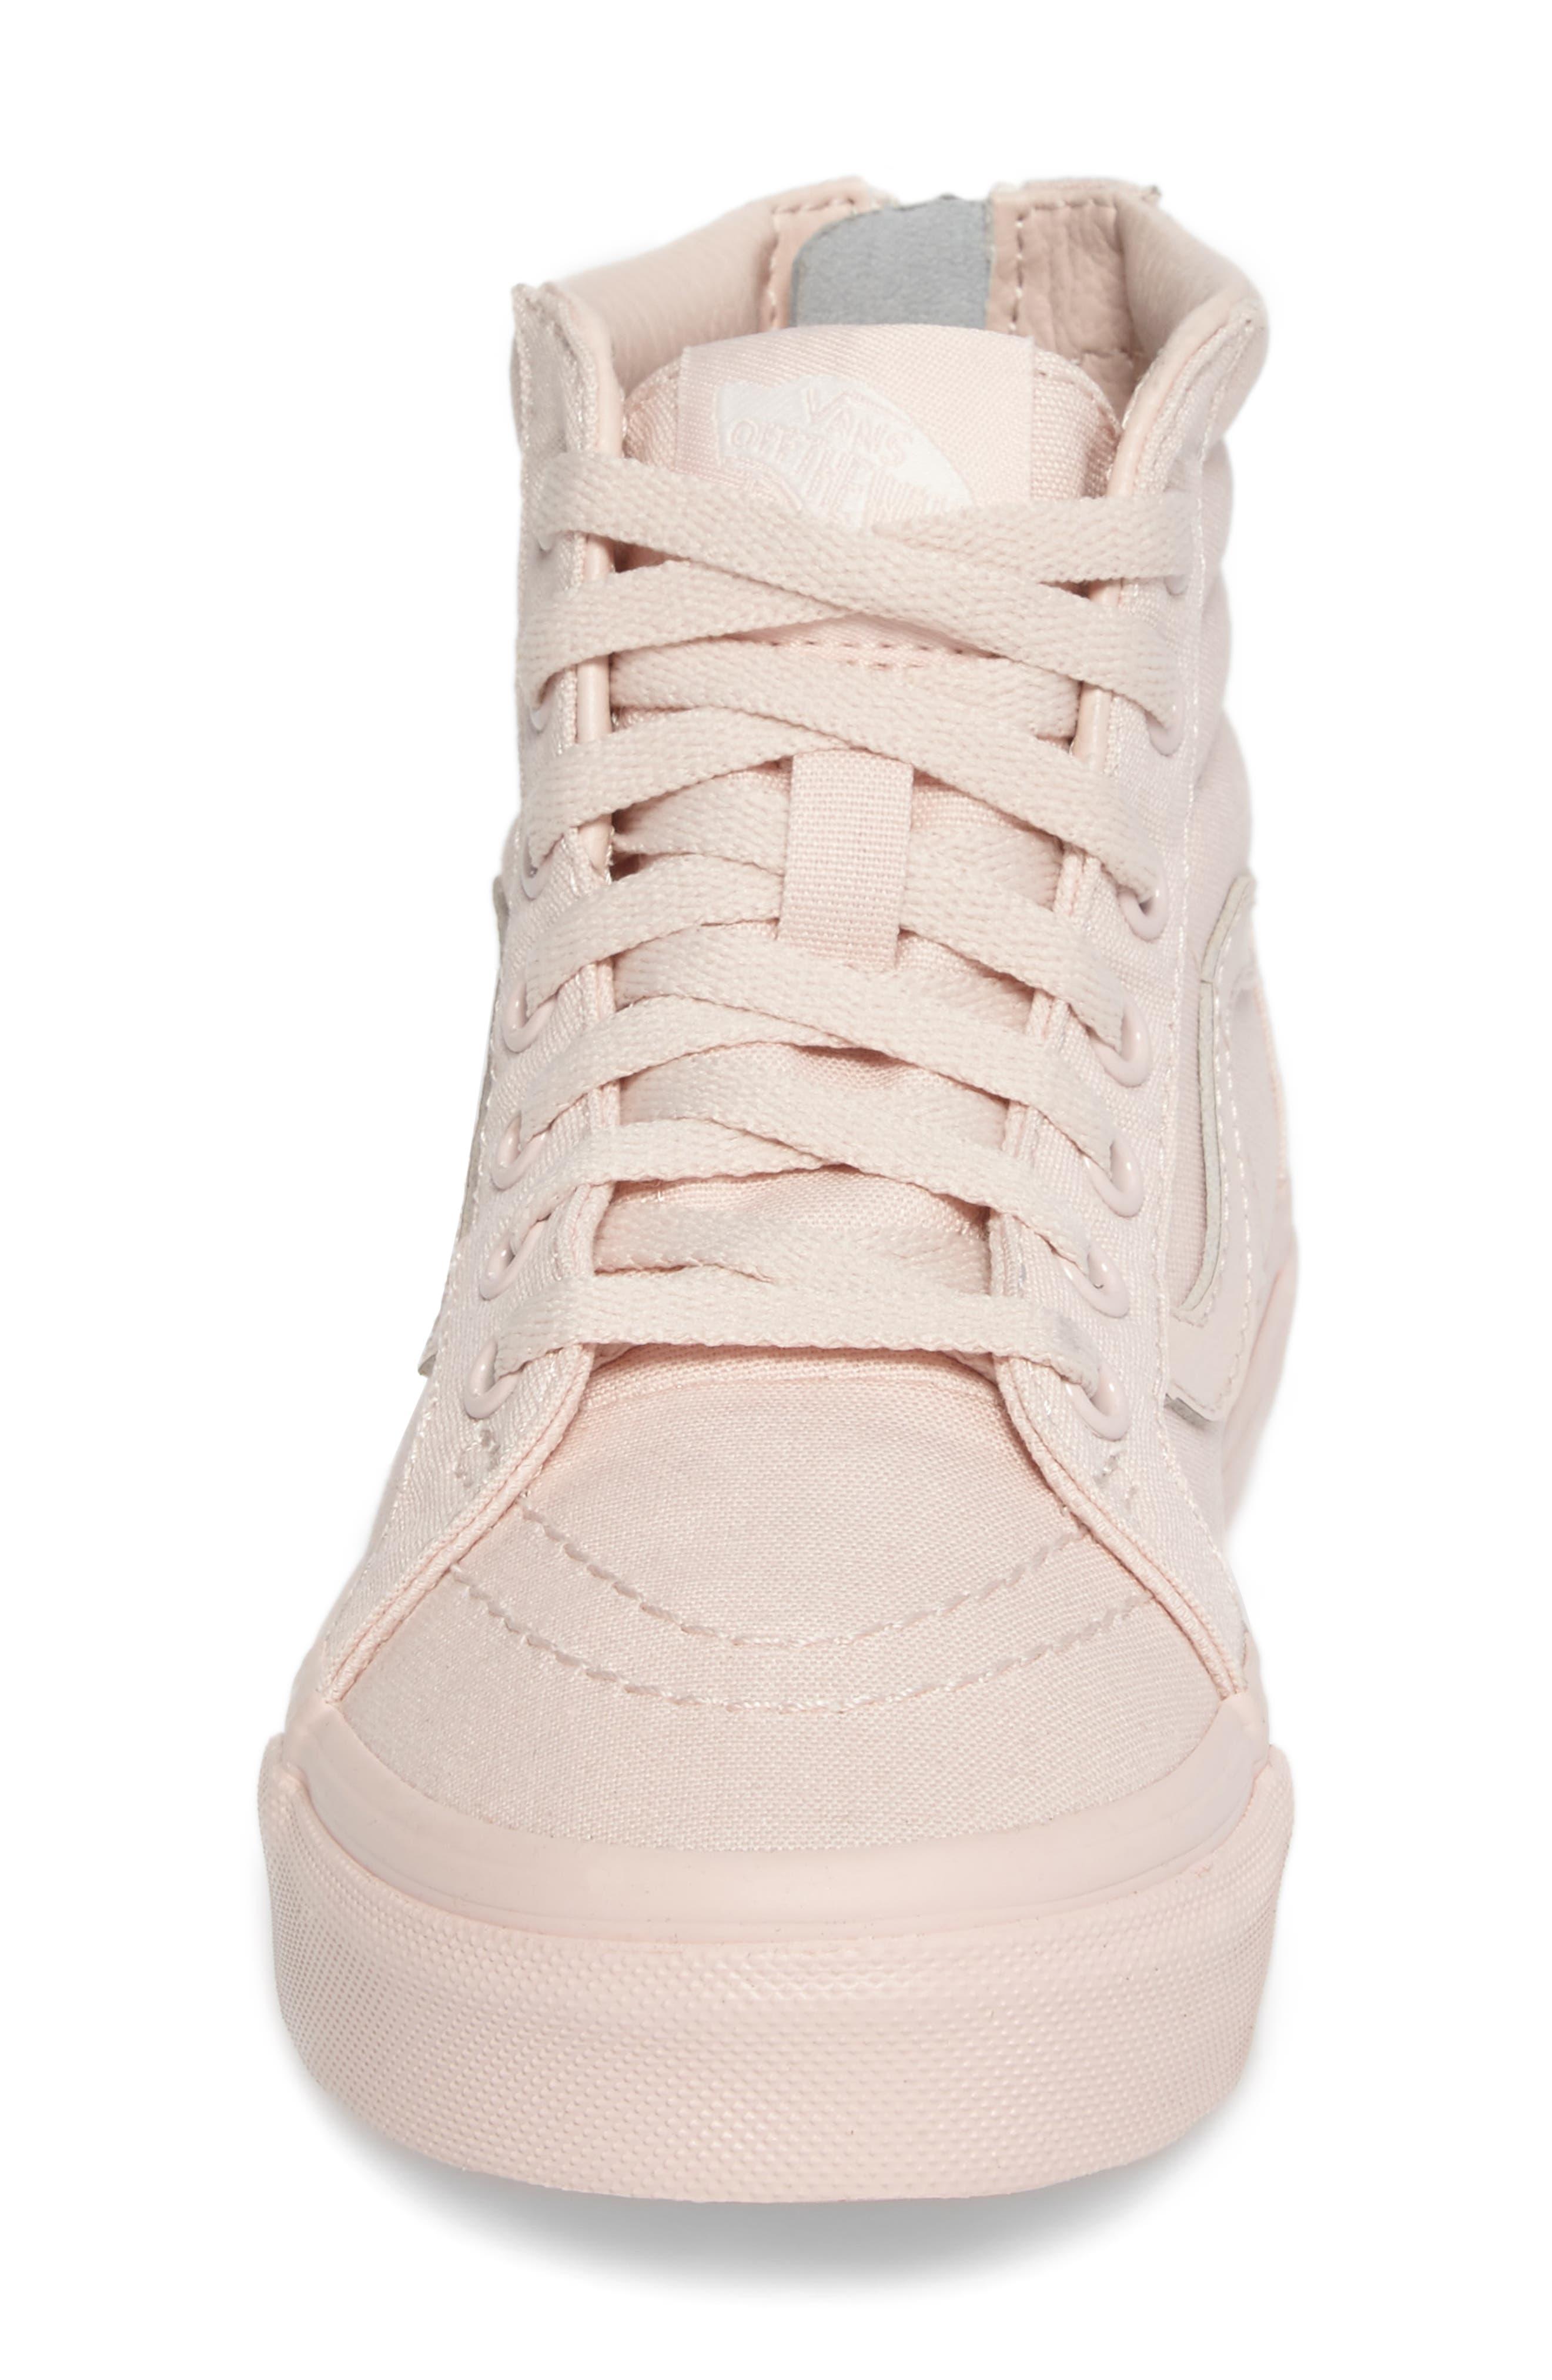 SK8-Hi Zip Sneaker,                             Alternate thumbnail 4, color,                             Peach Blush Canvas